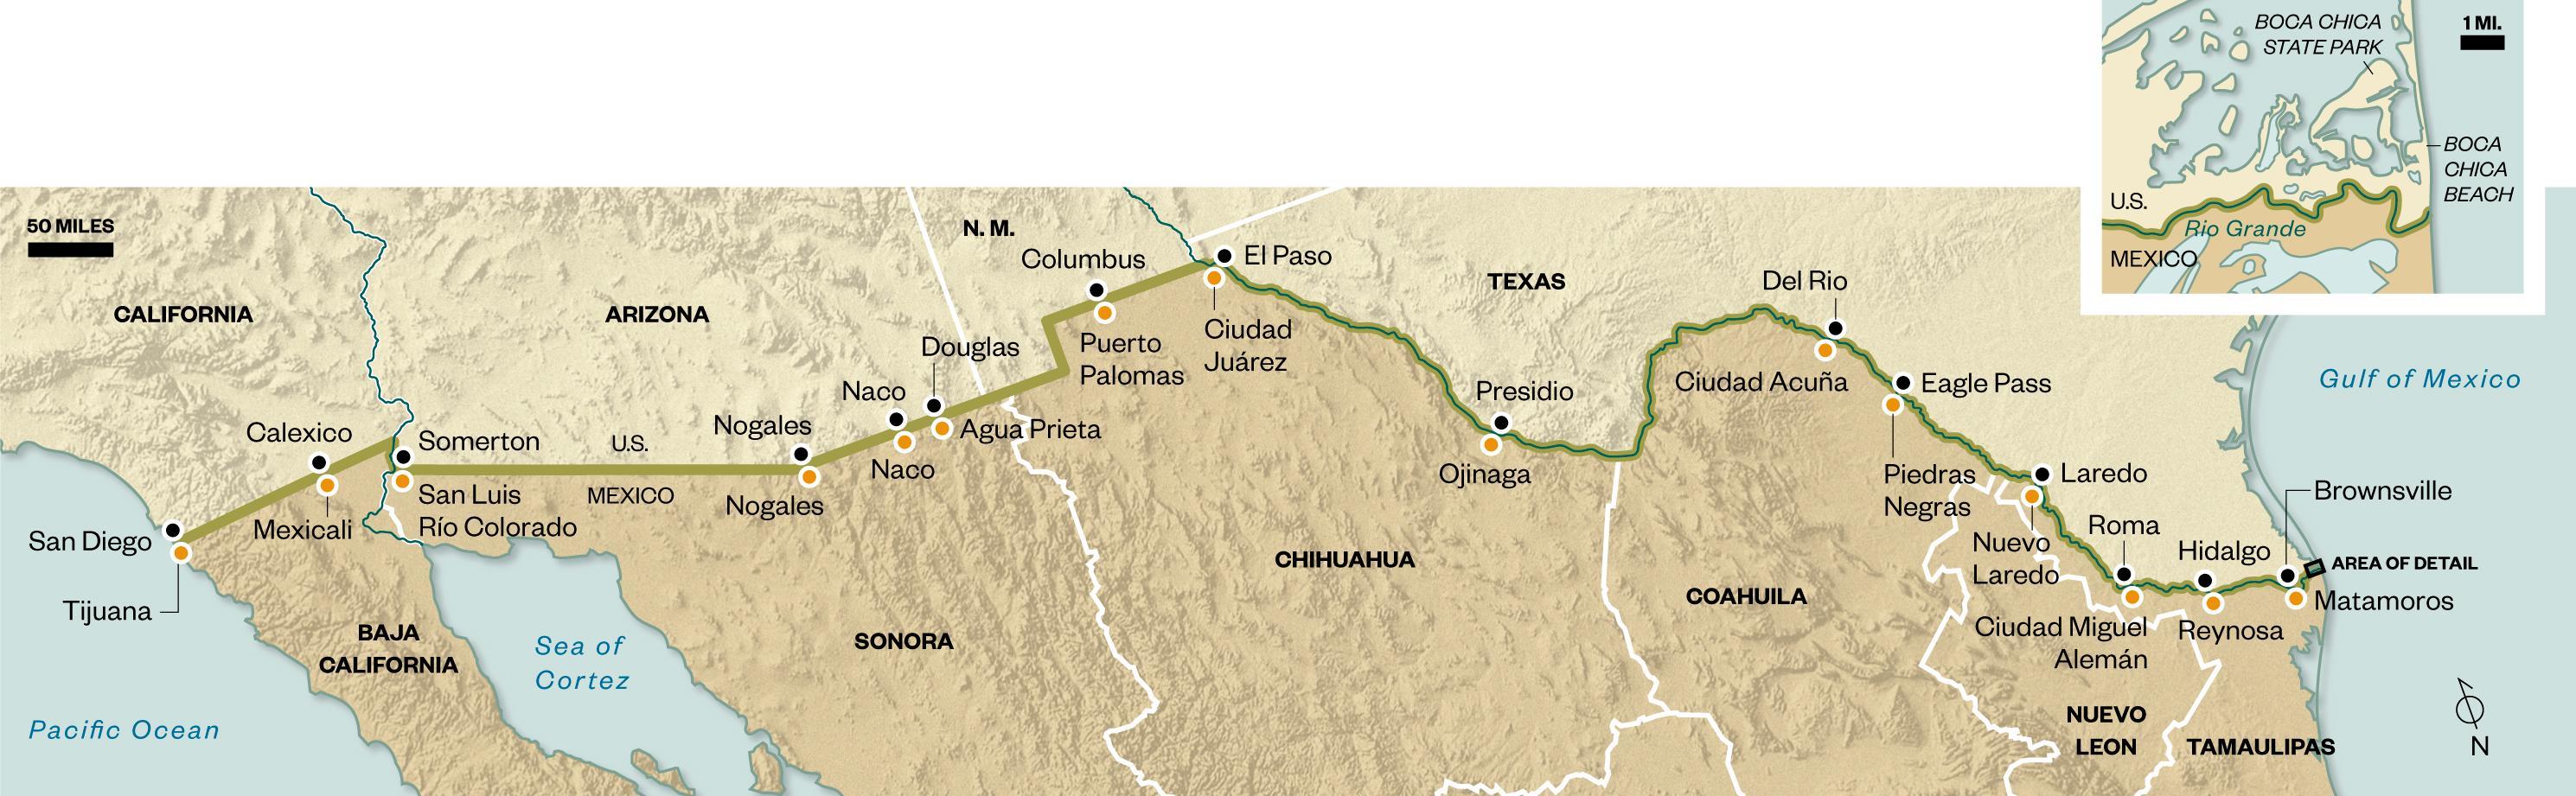 U.S.-Mexico border map